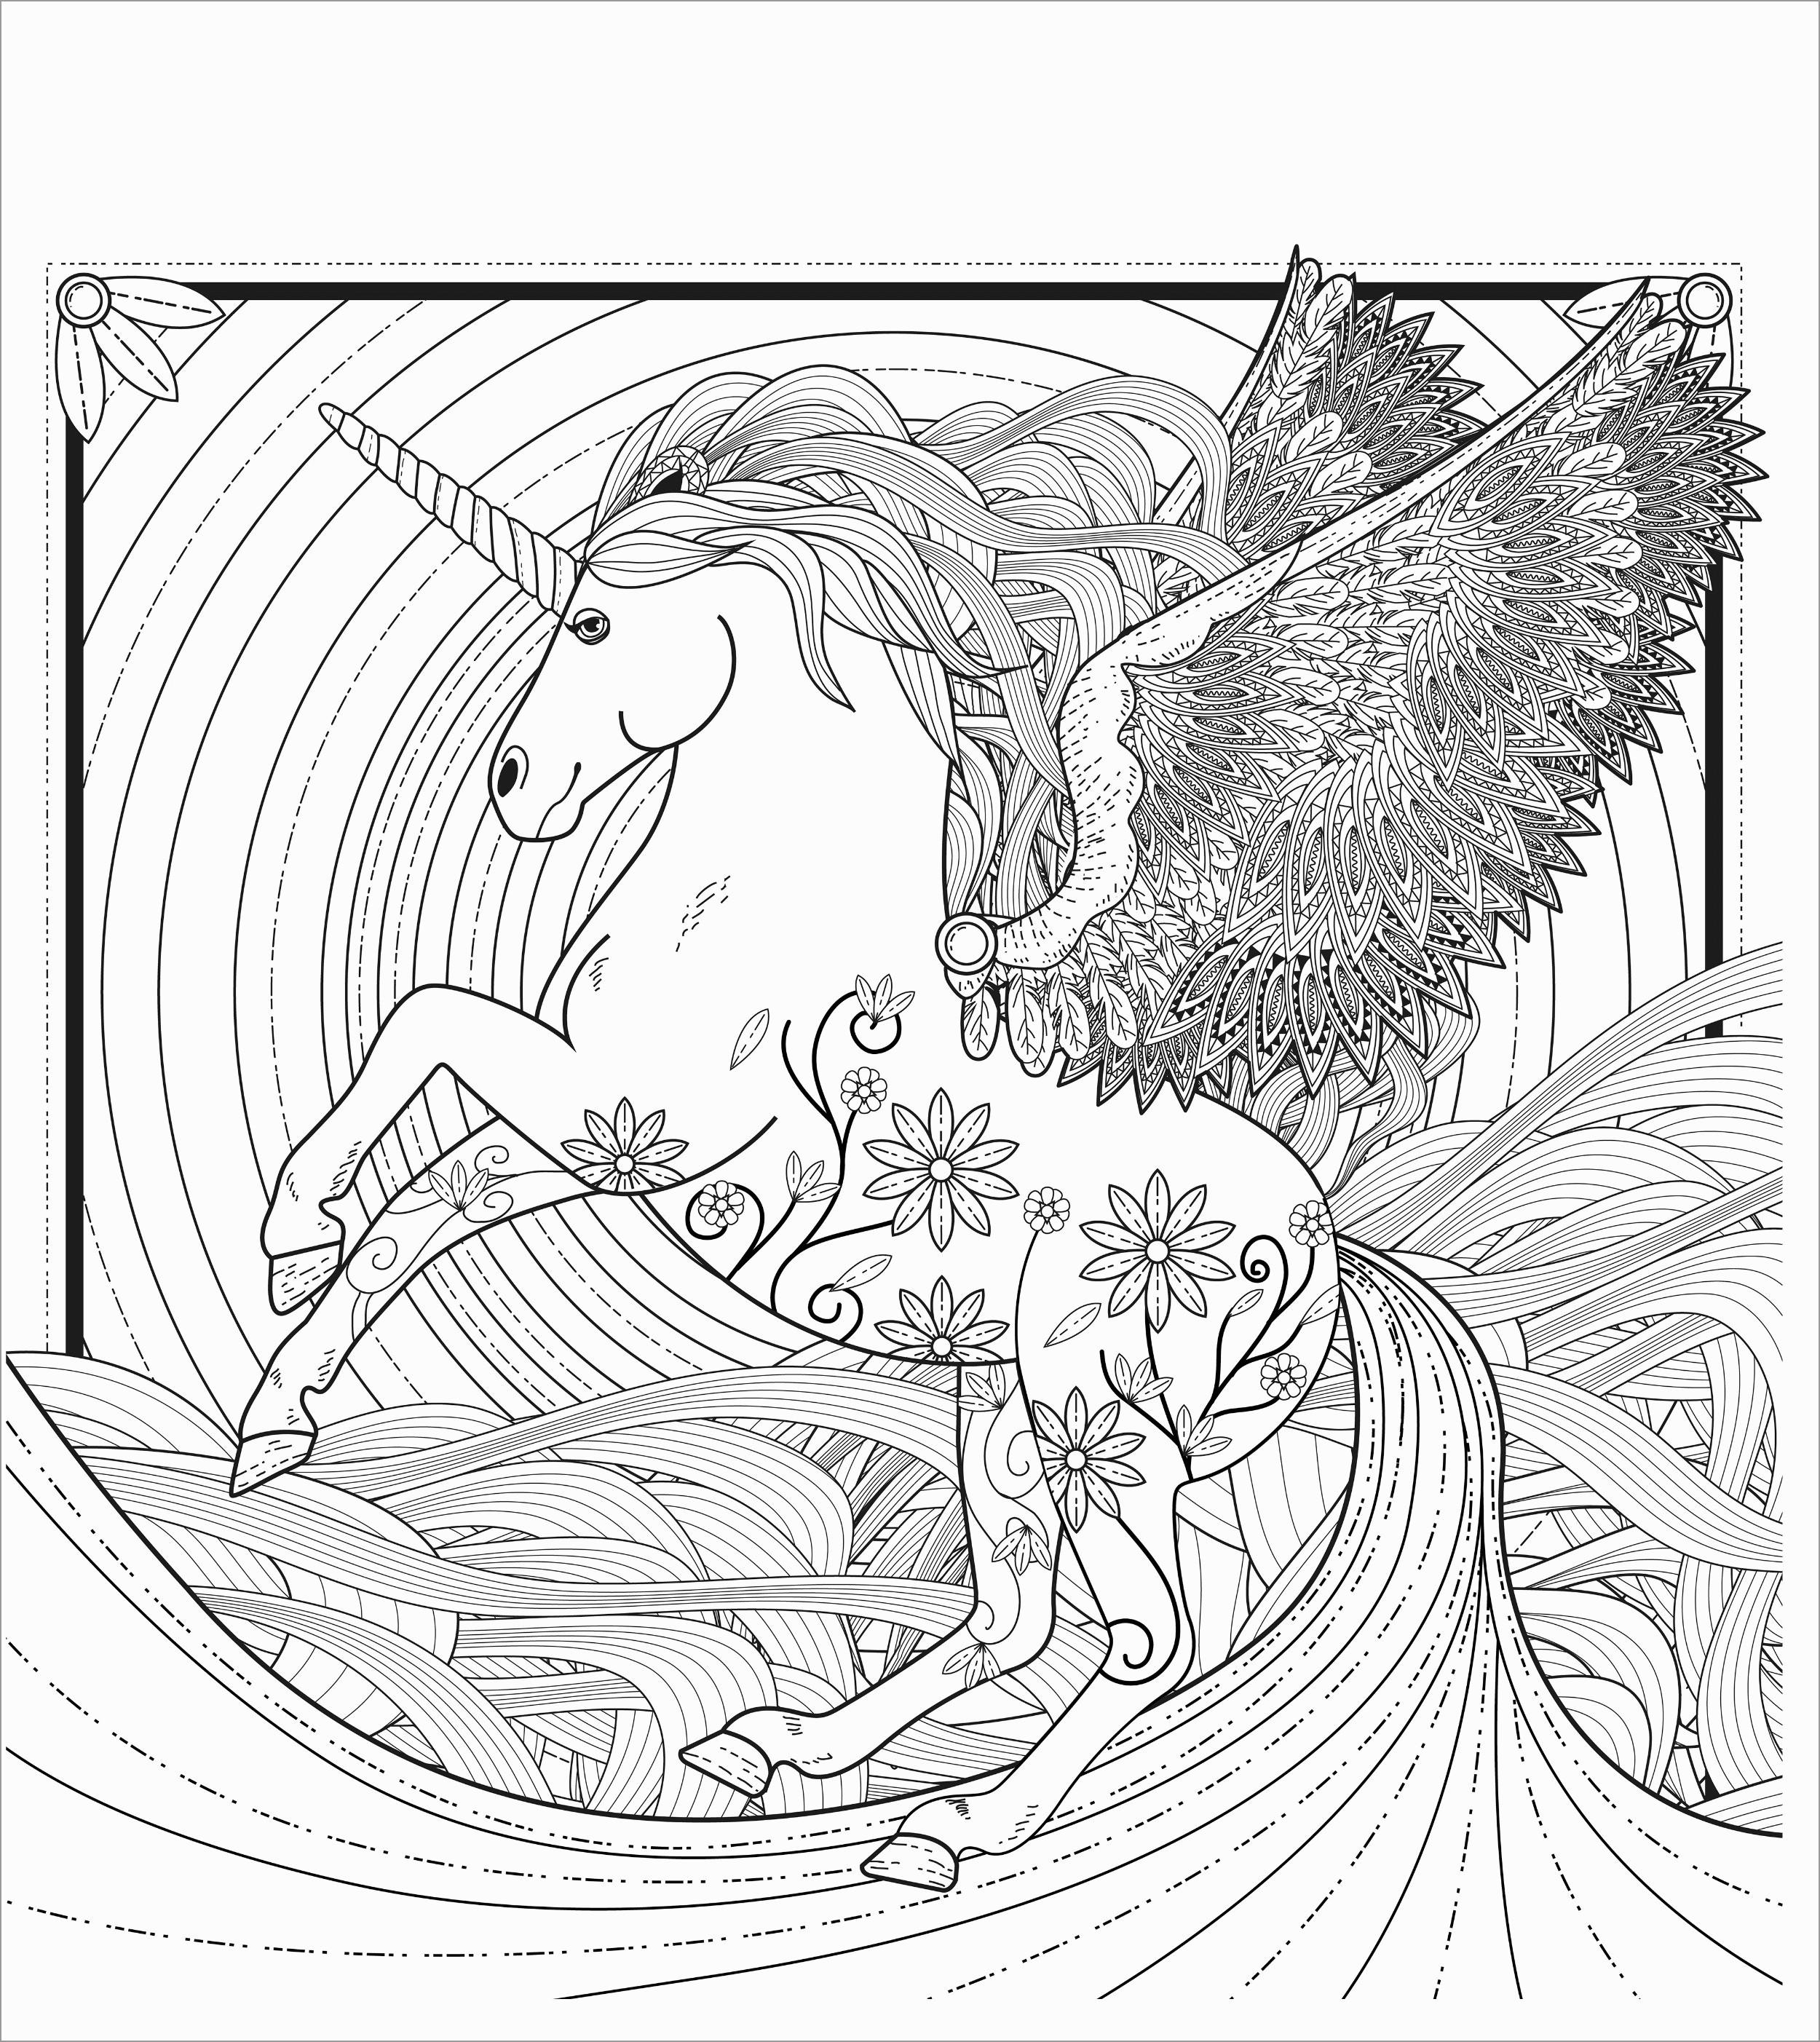 Mandala Unicorn Coloring Page for Adults